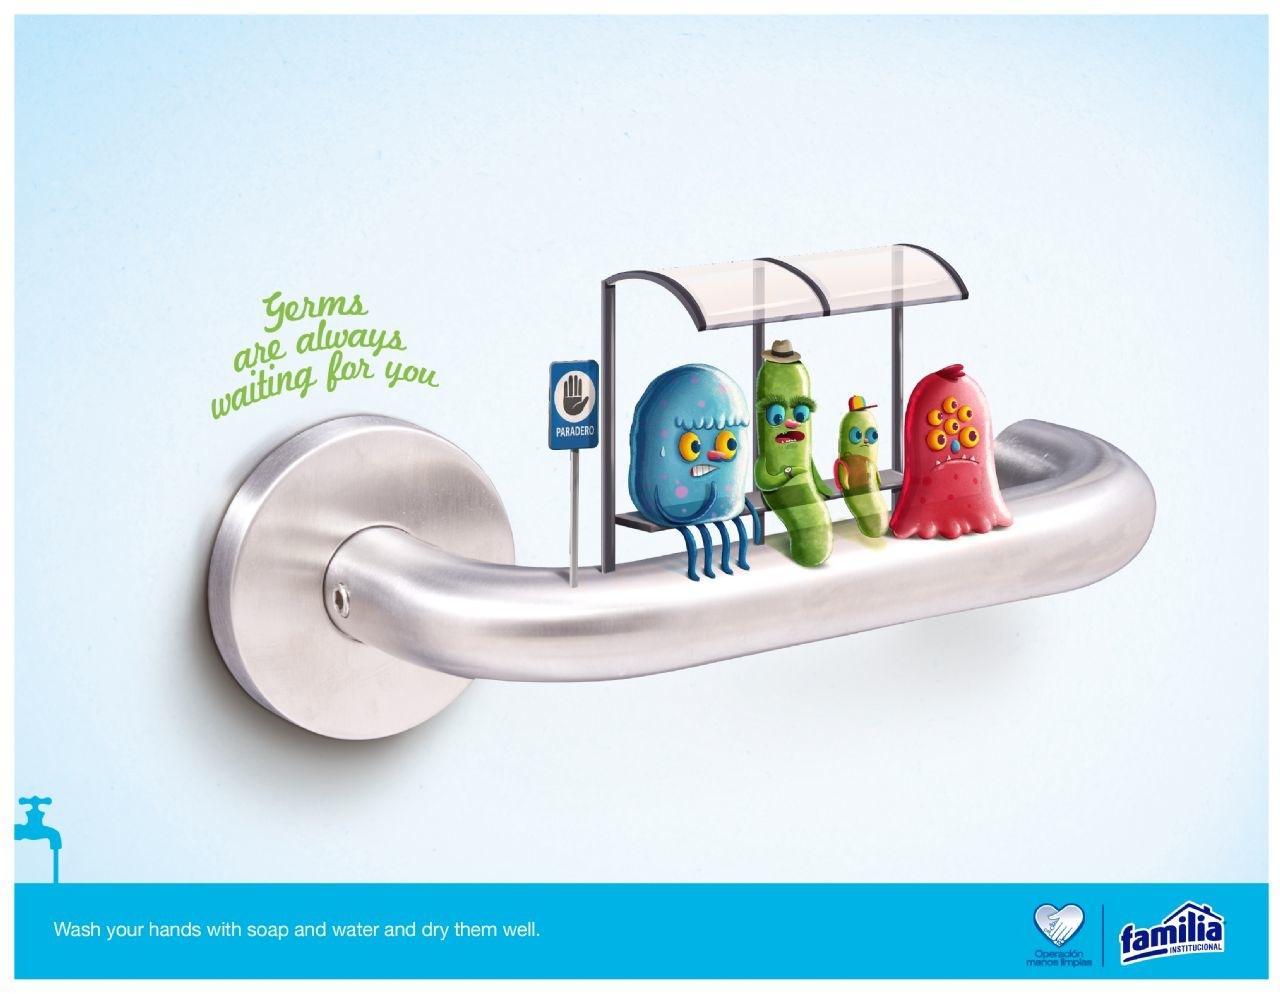 Familia Print Ad -  Germs, 2